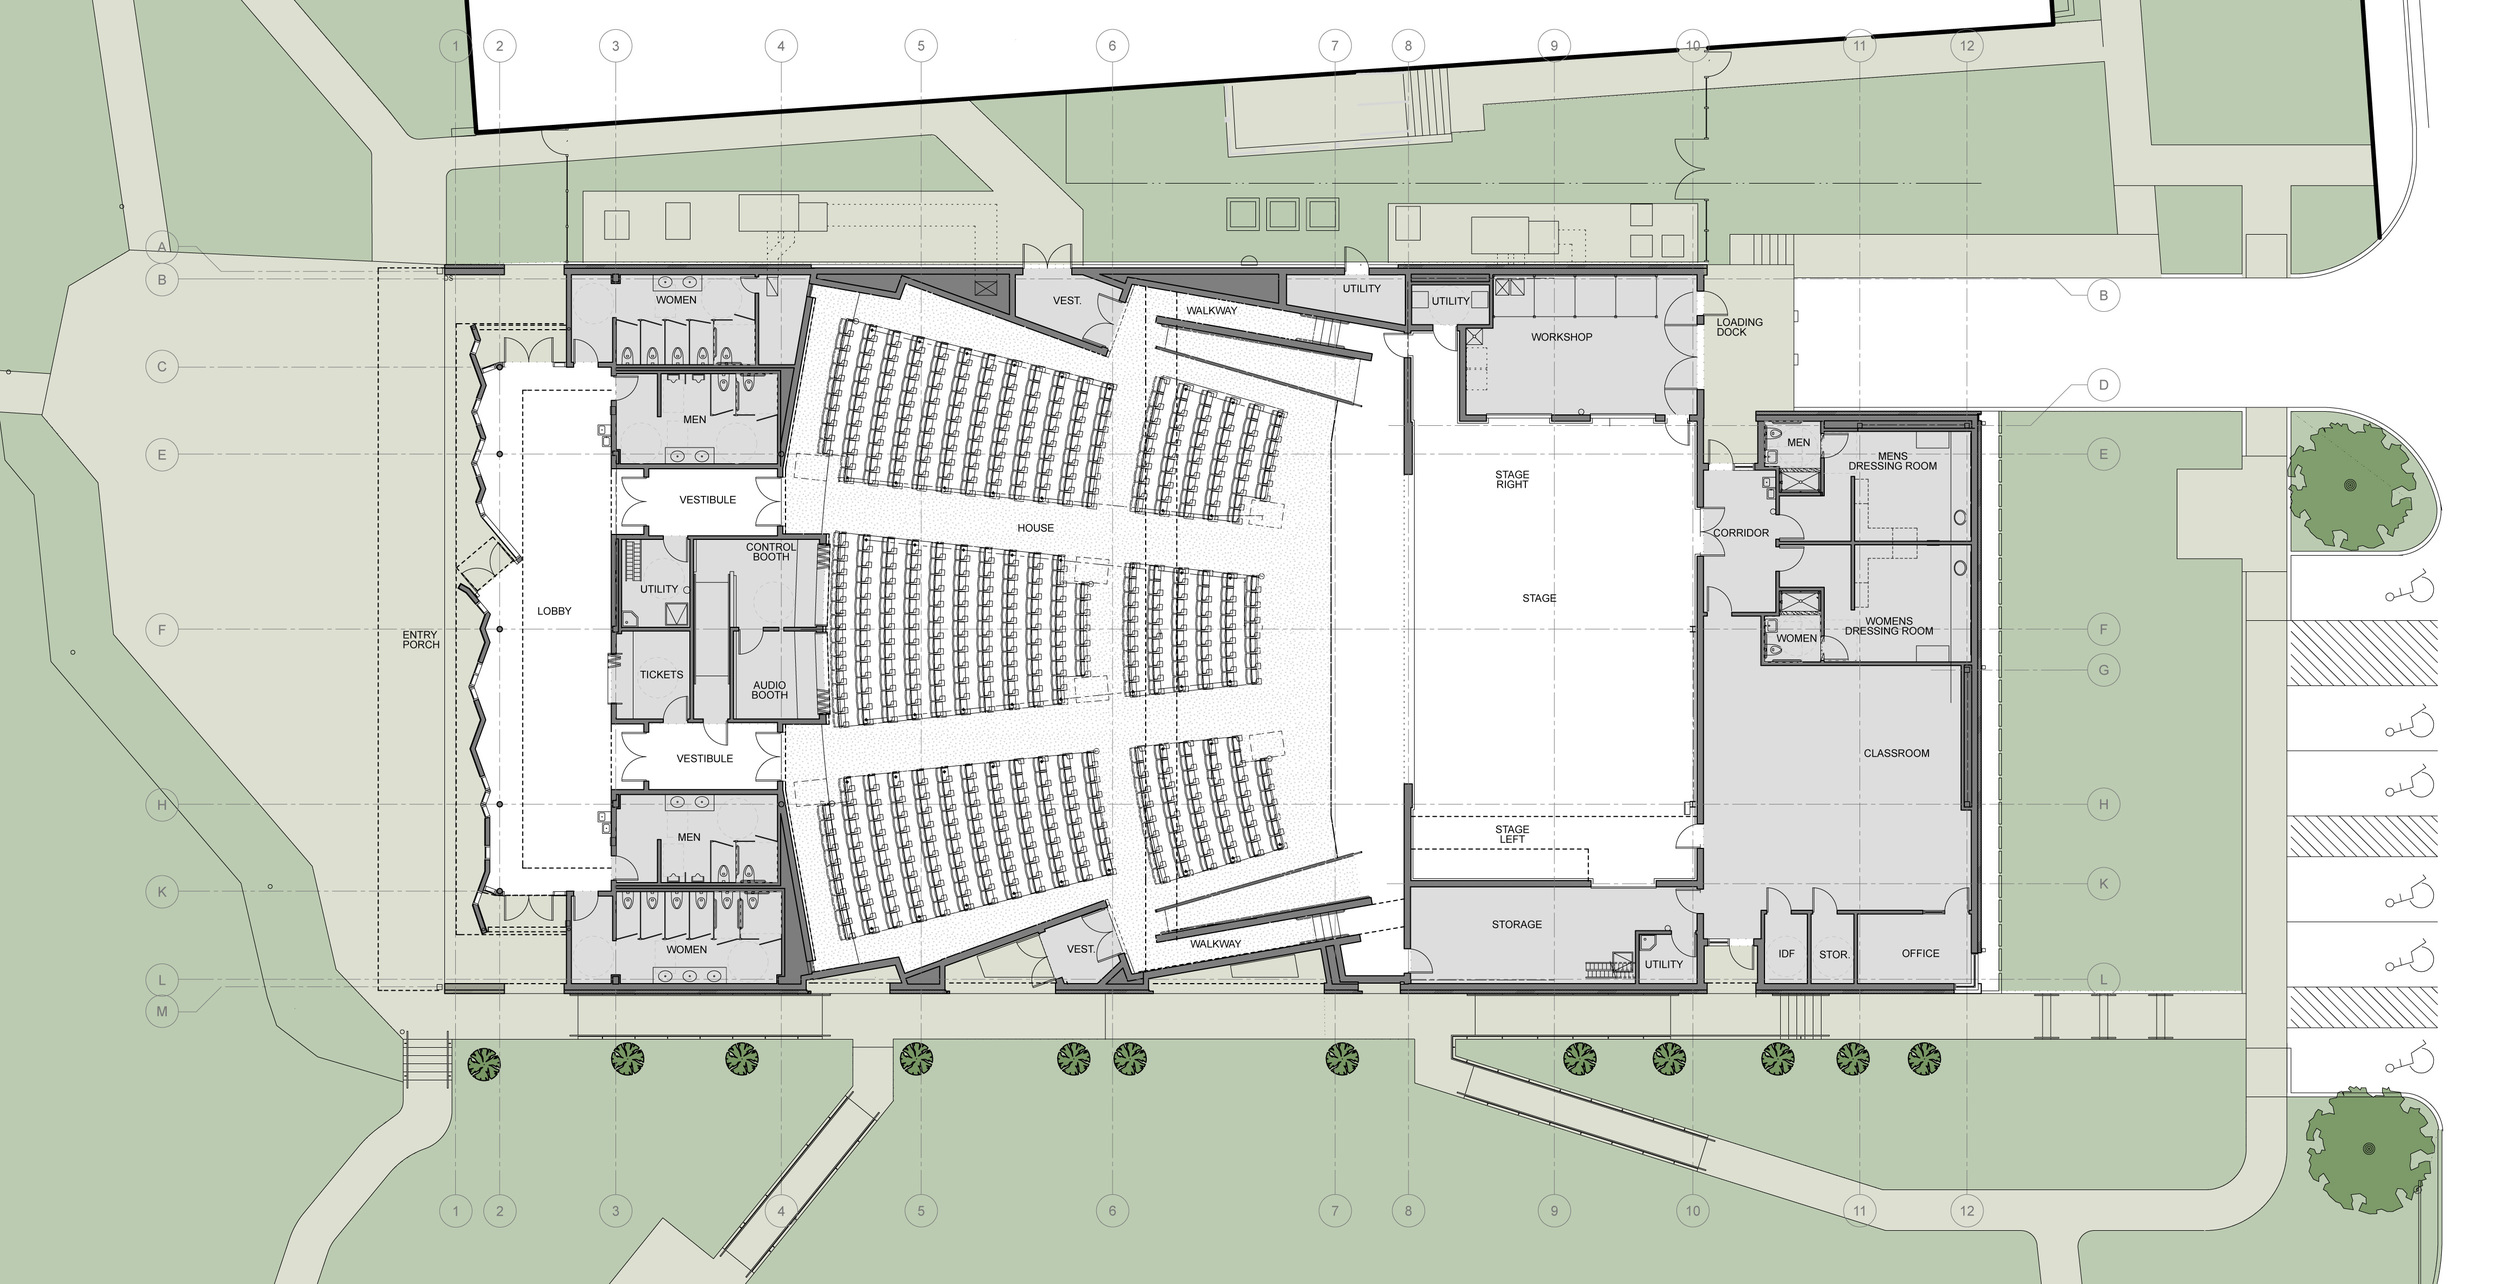 LBJ theater_Plan.jpg